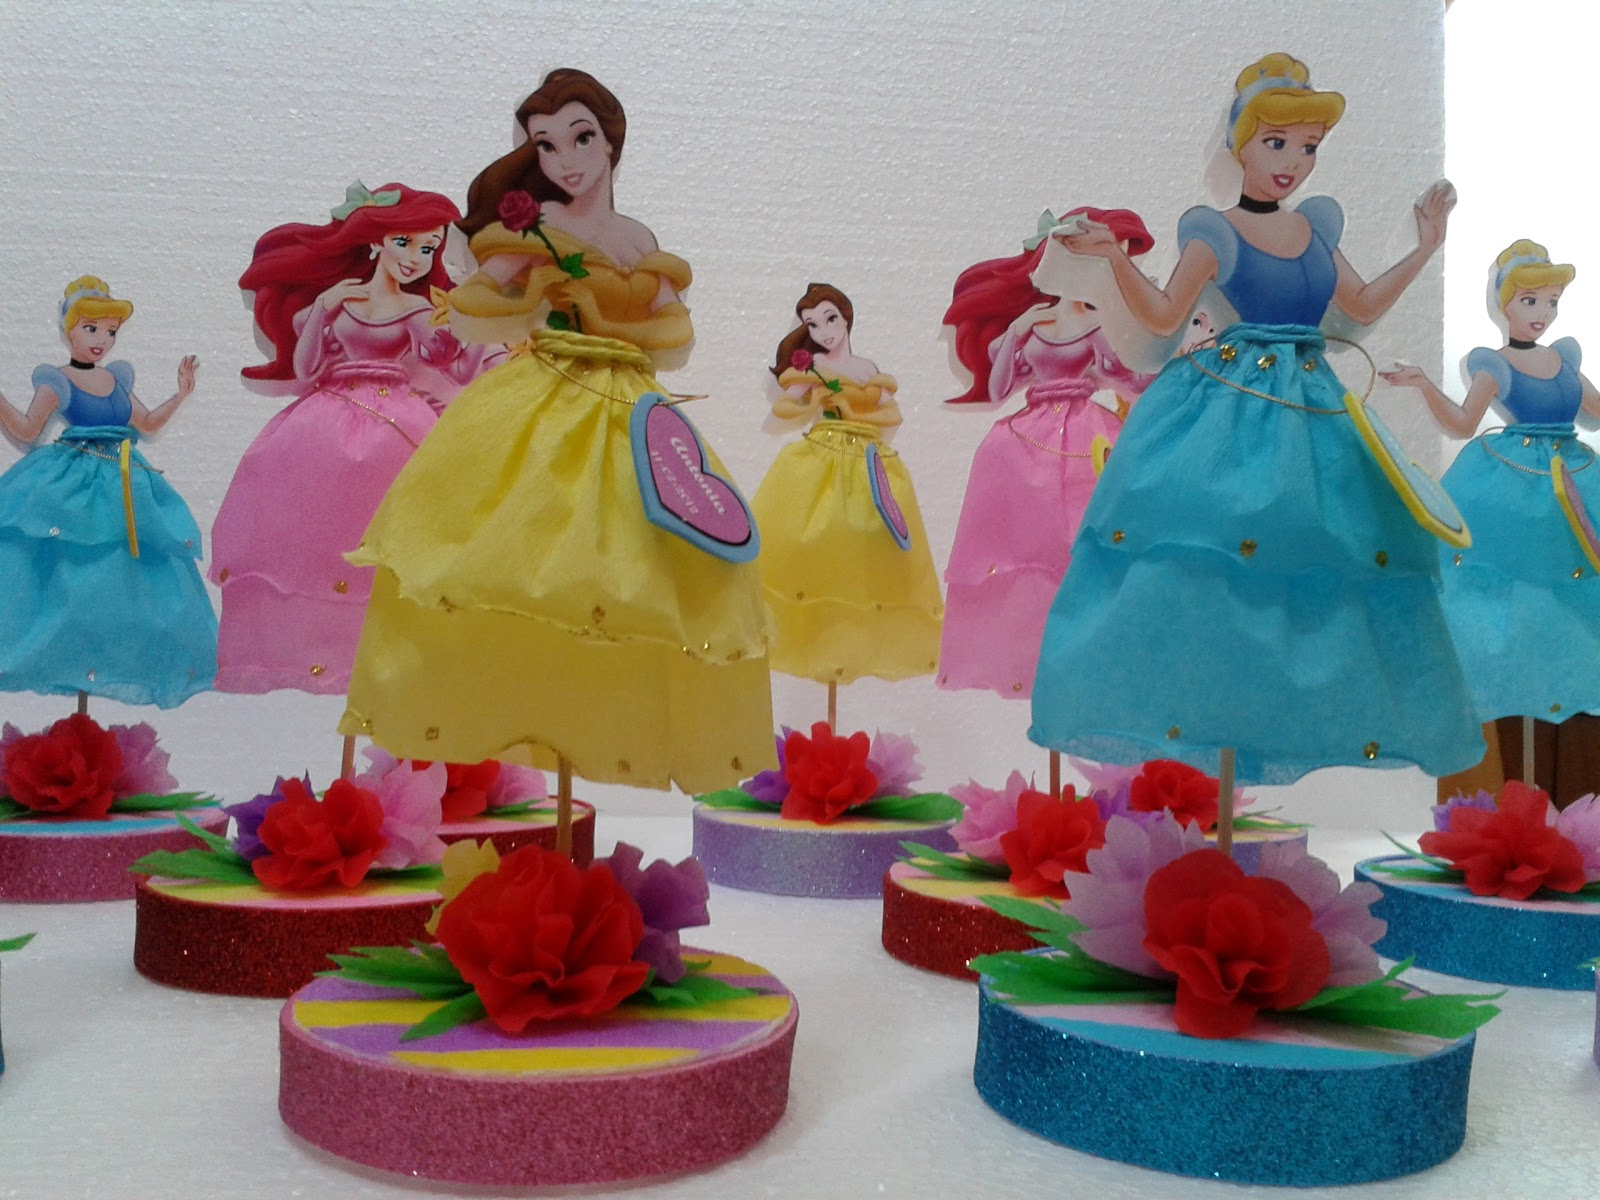 Decoraciones infantiles souvenir princesas - Decoracion cumpleanos infantiles manualidades ...